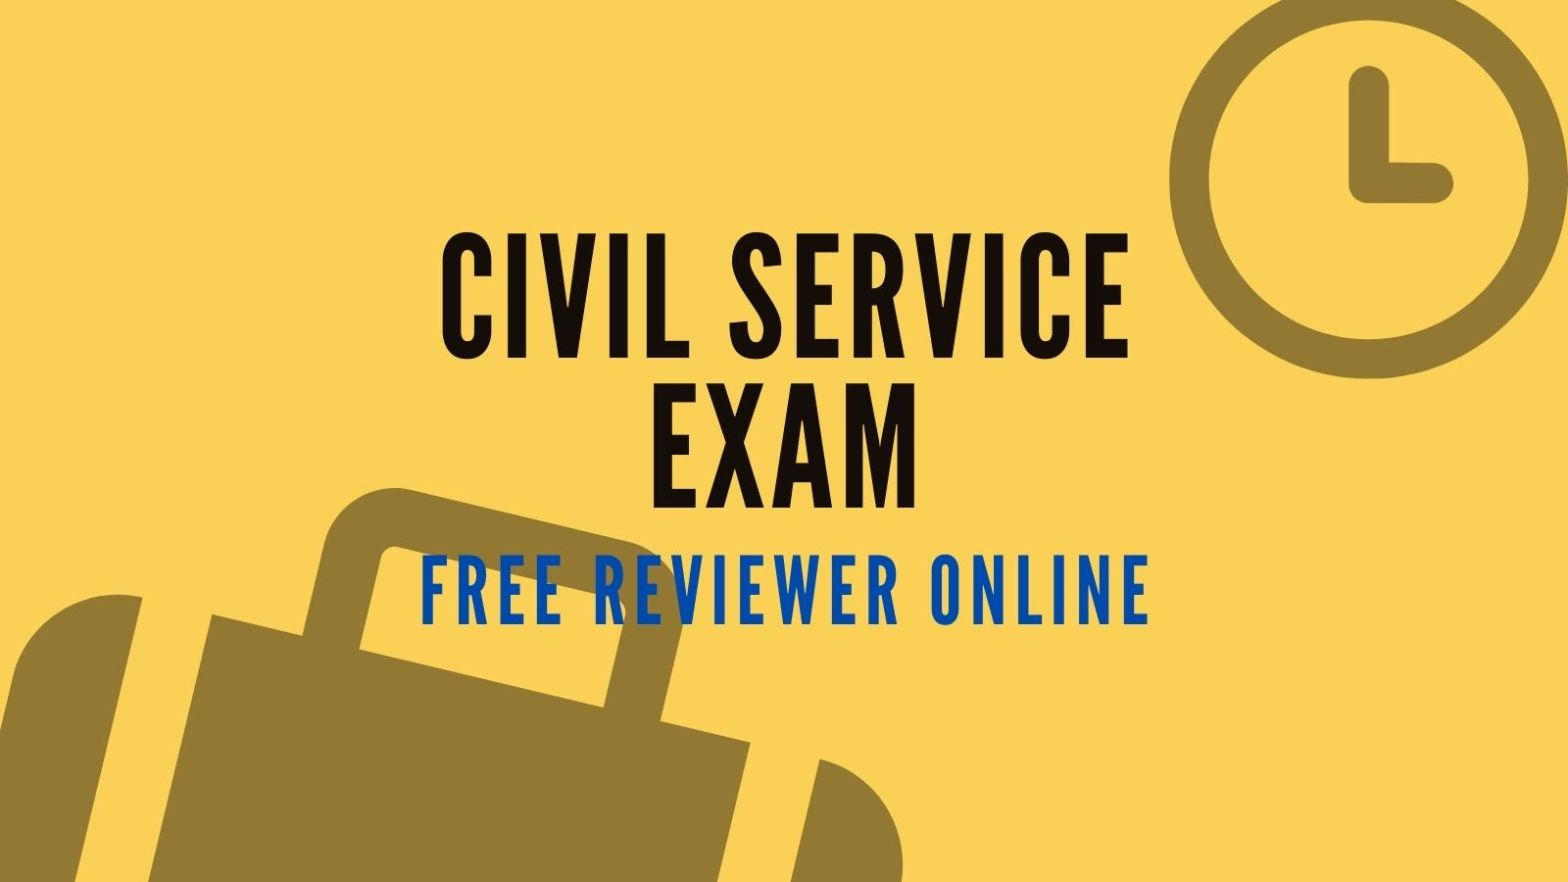 civil service exam free online reviewer philippines